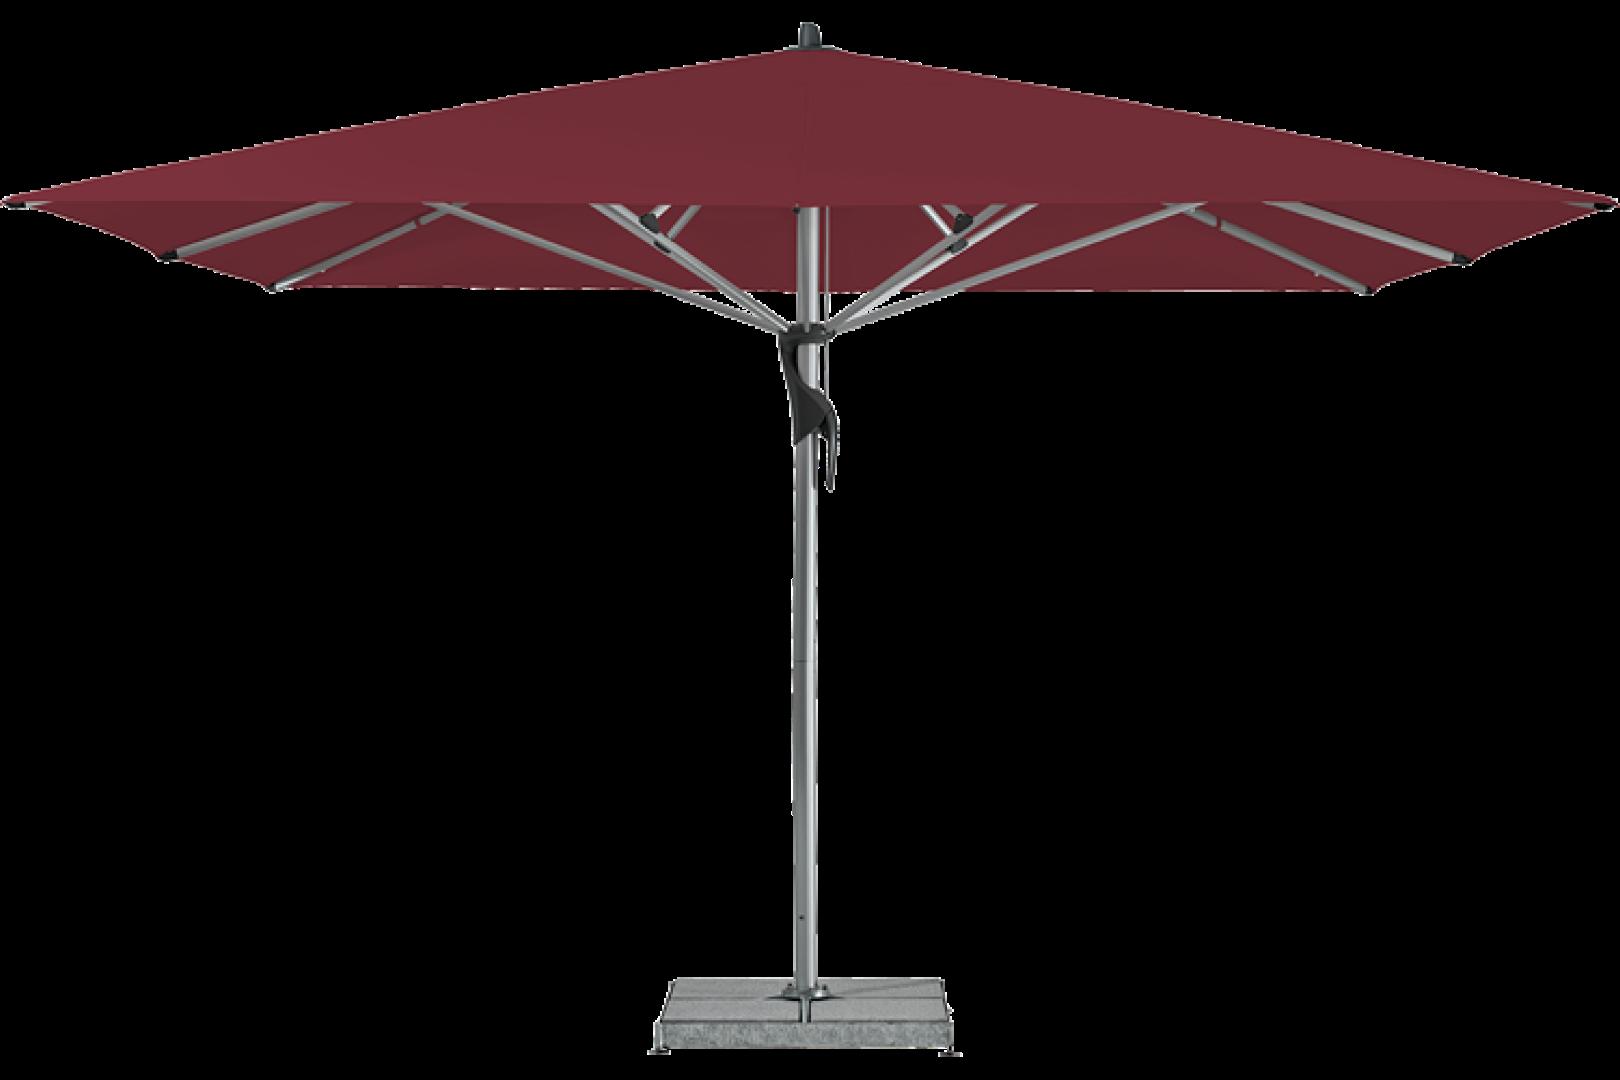 Fortello Maarket Umbrella